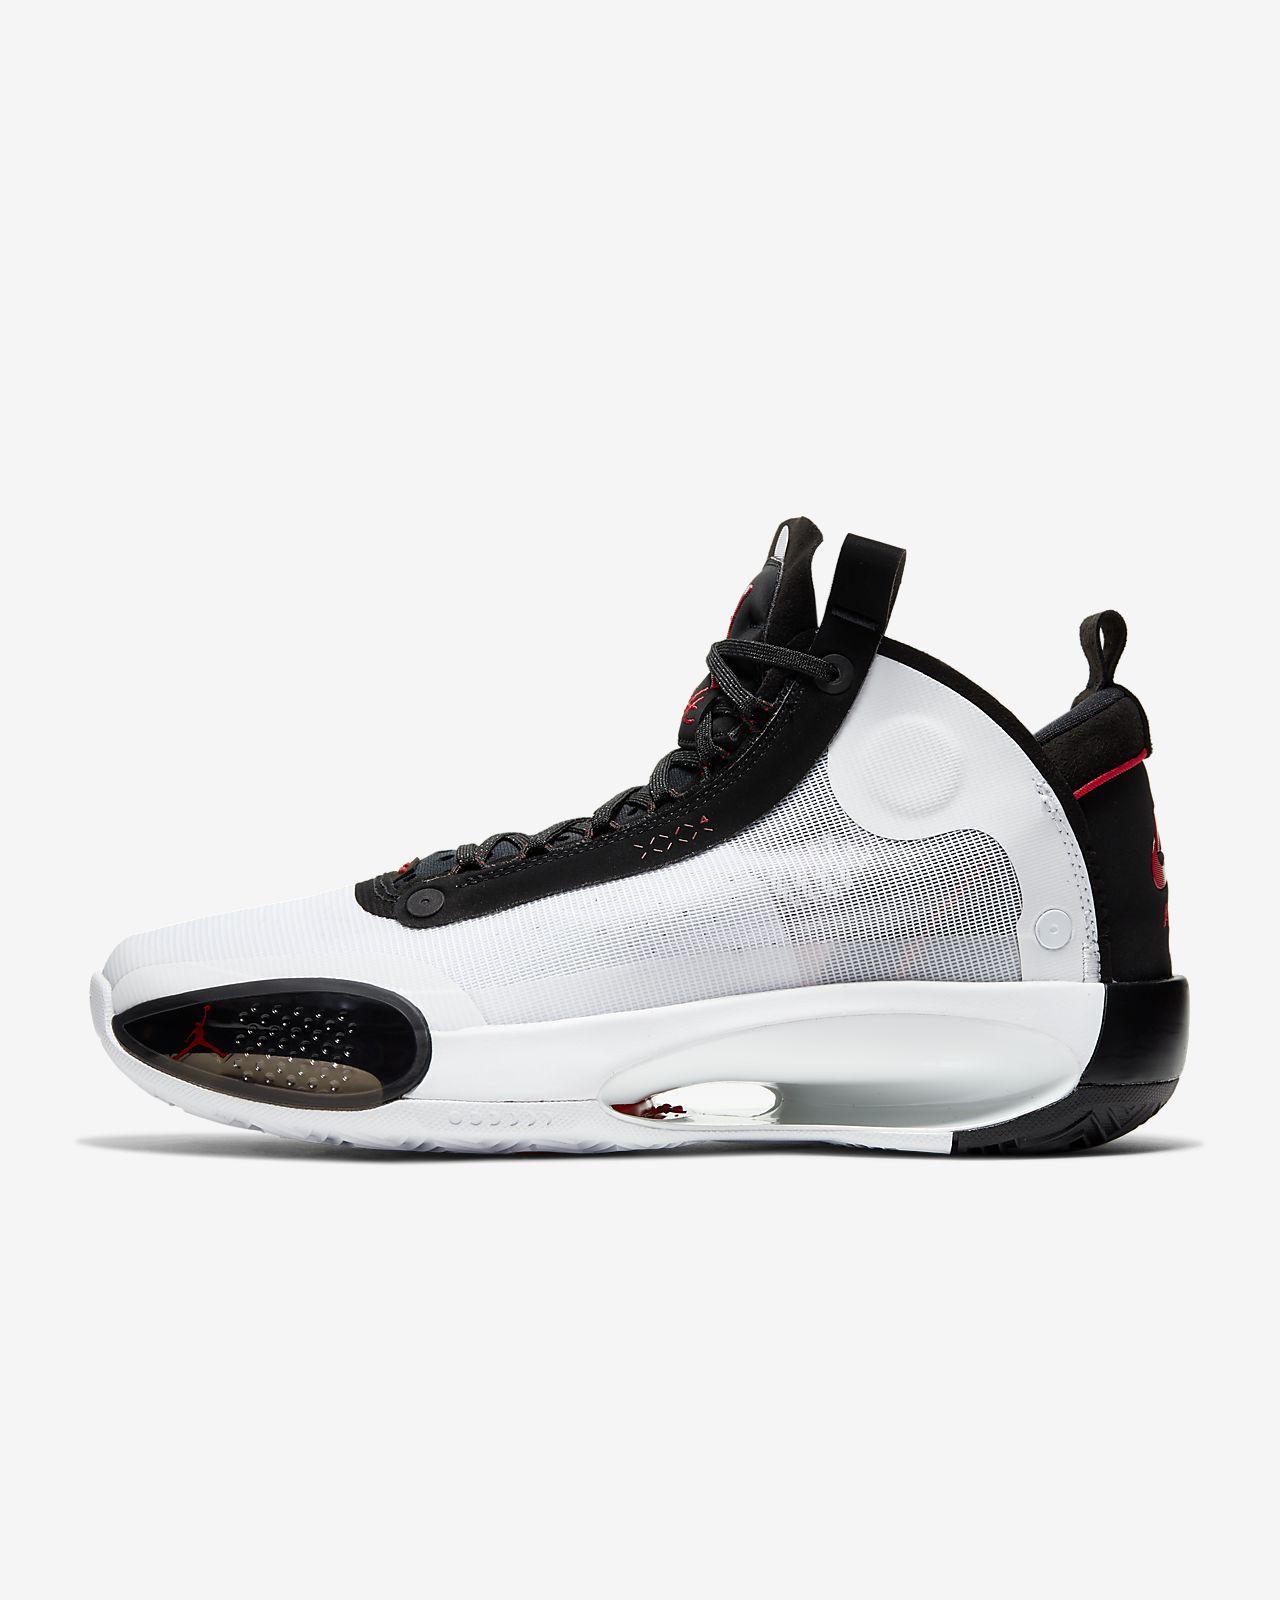 Air Jordan XXXIV Basketball Shoe